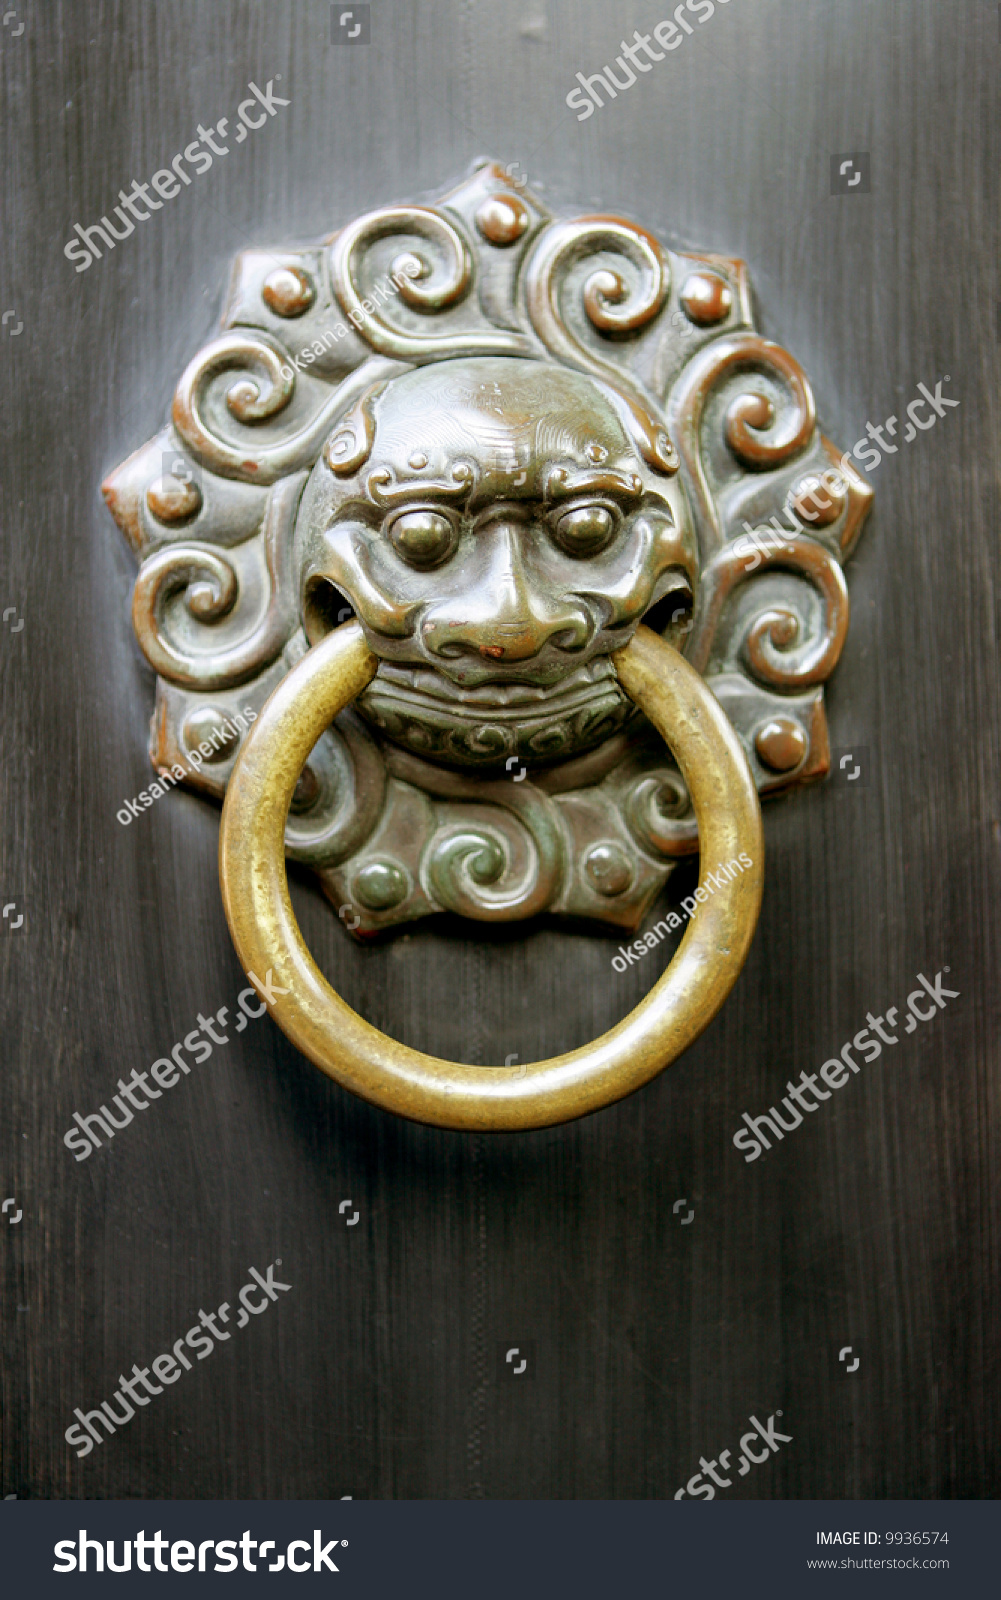 Antique Lion Head Door Knob Chinese Stock Photo 9936574 - Shutterstock